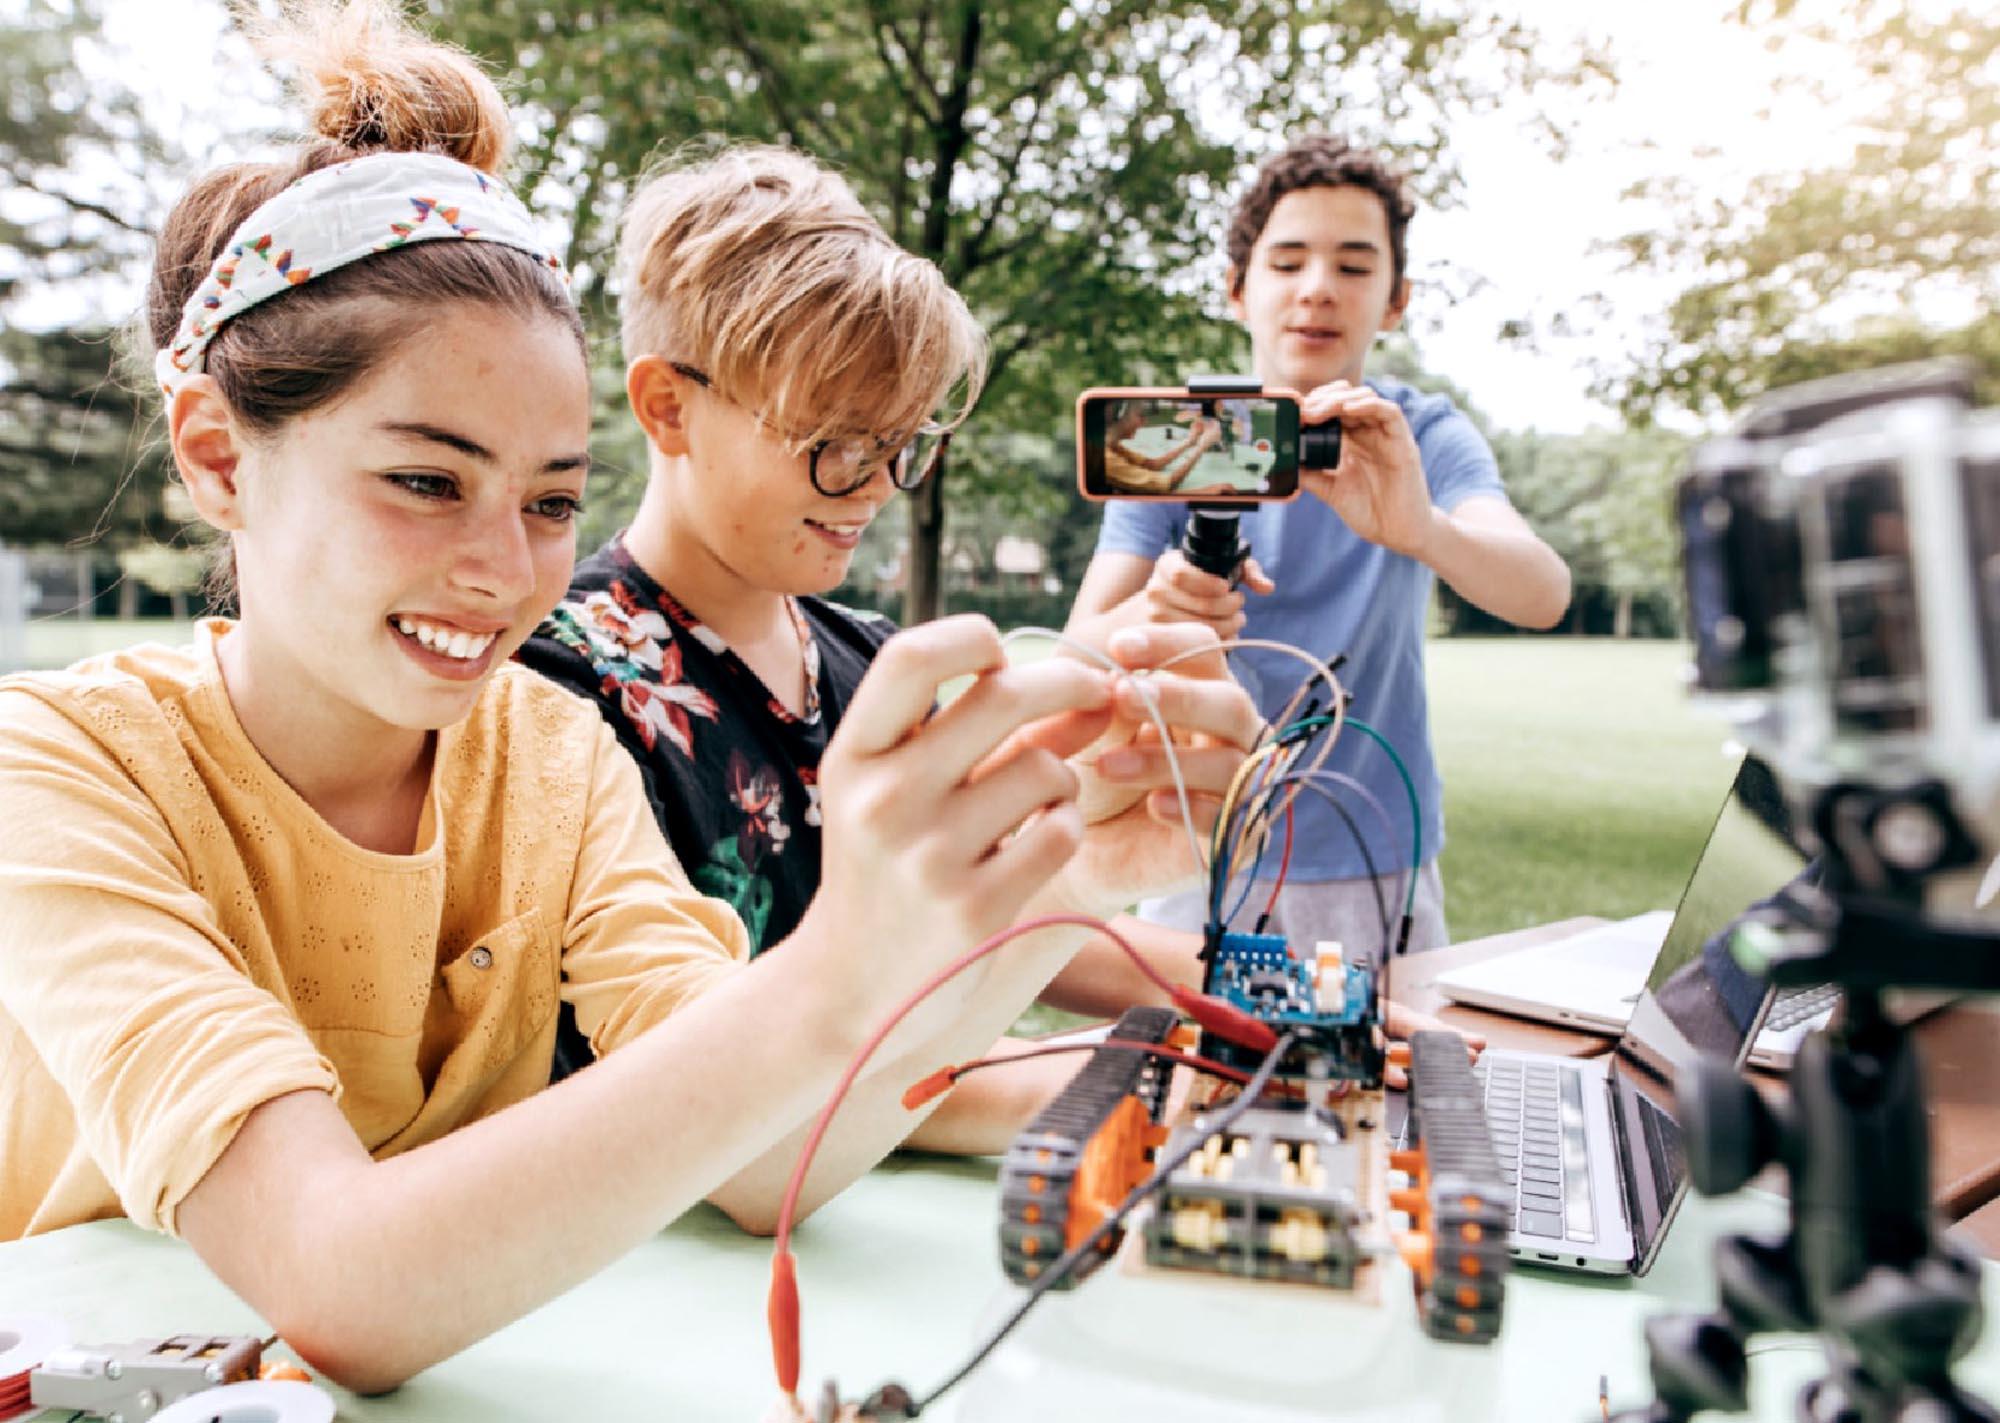 children building robots